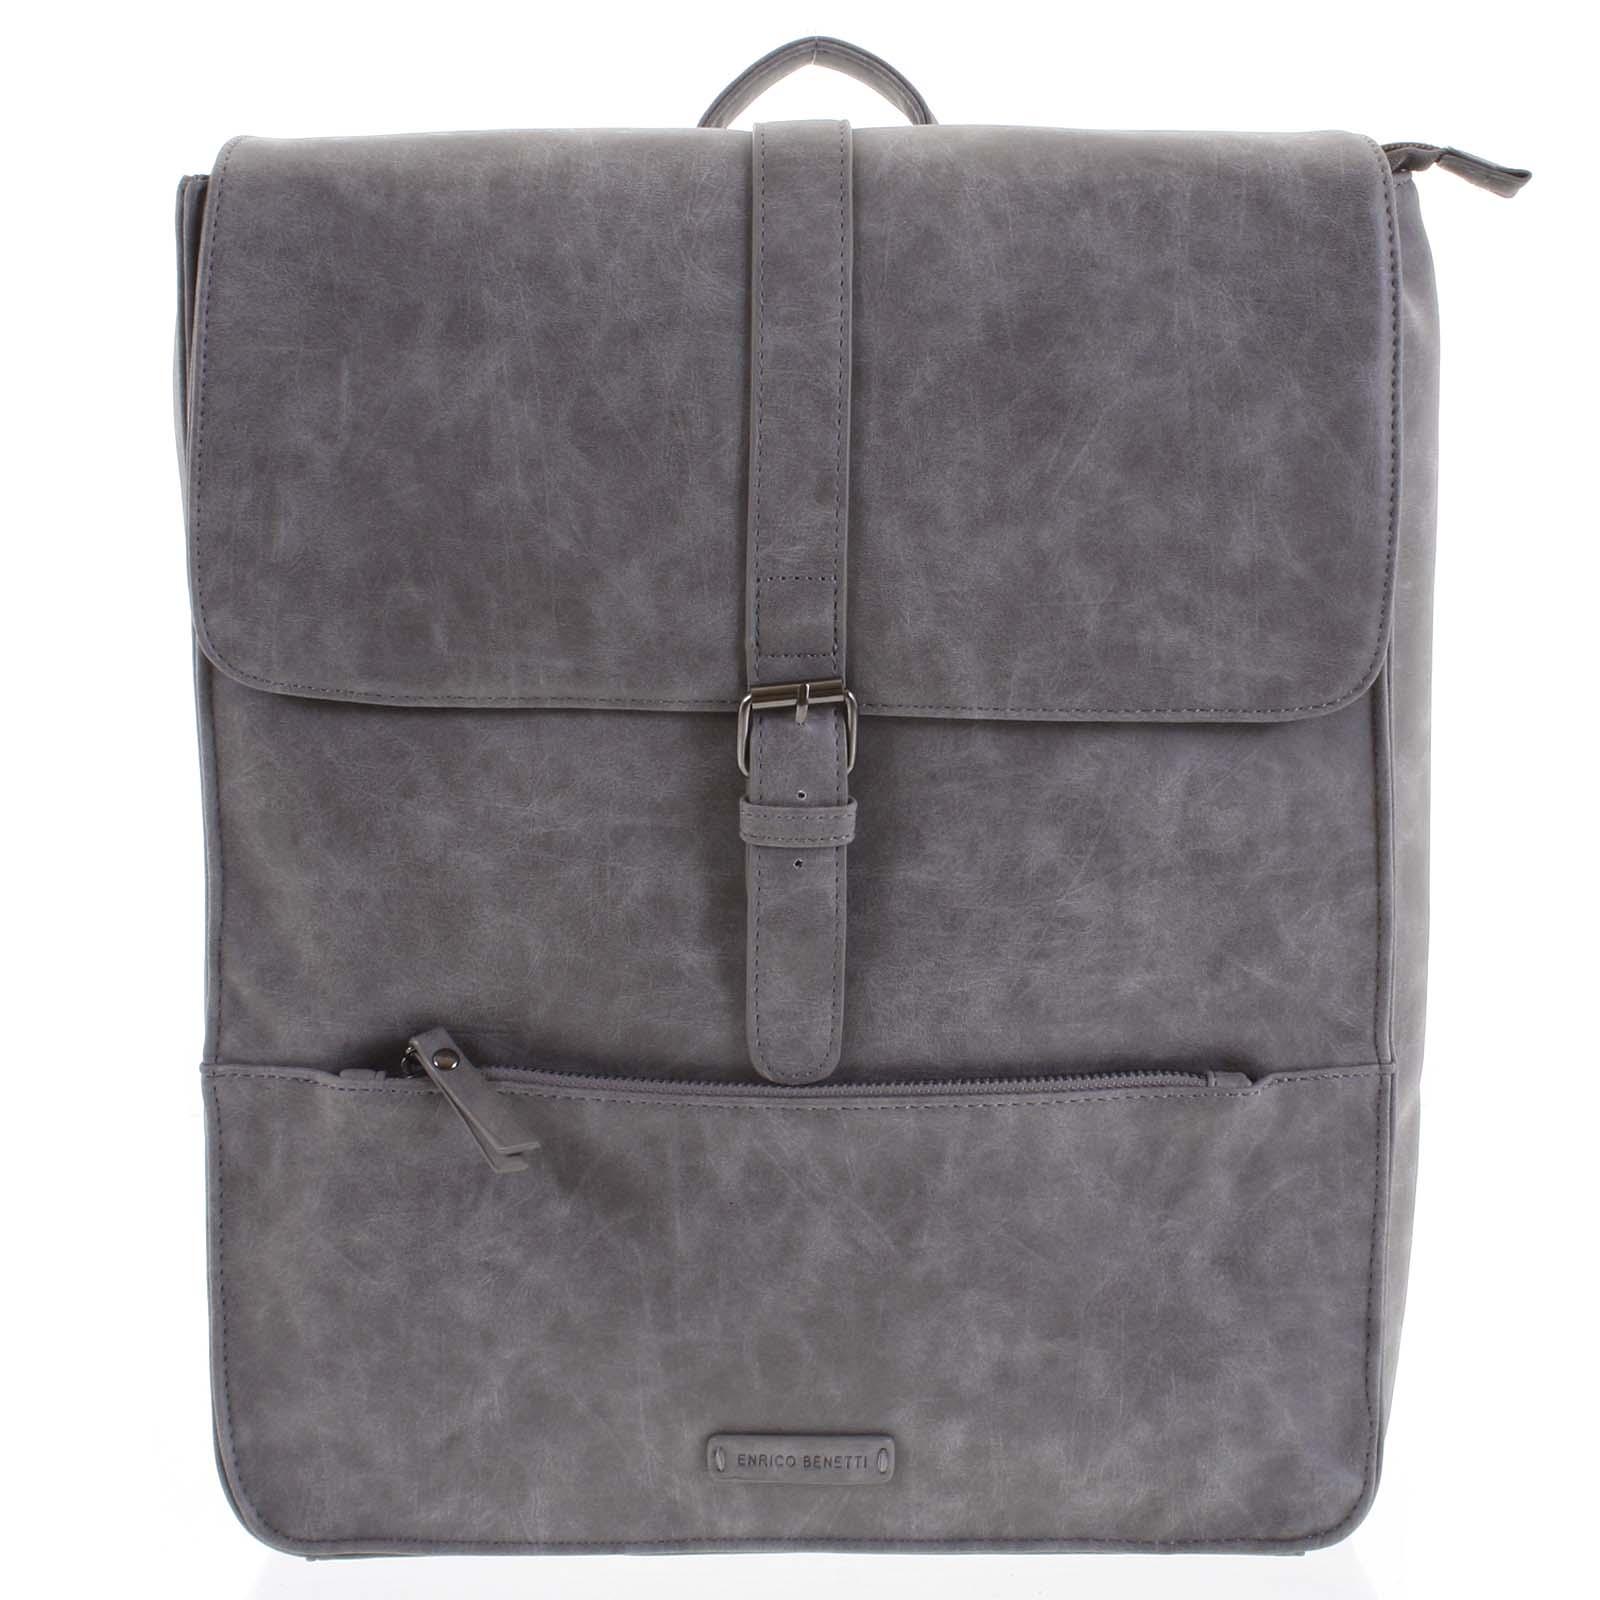 Moderný batoh stredne sivý - Enrico Benetti Kaarlo